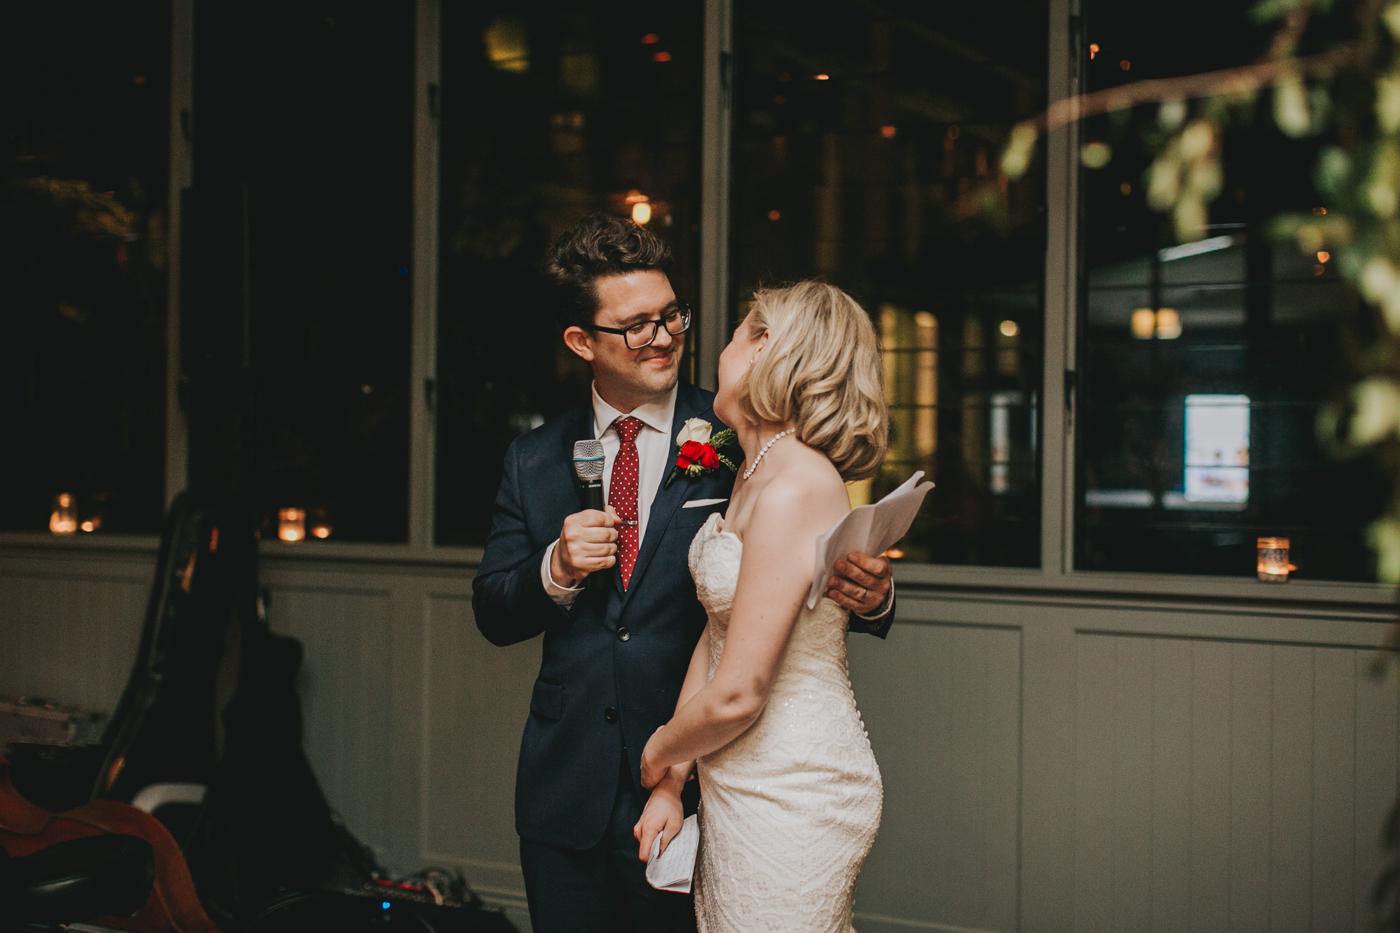 Jo & Tom Wedding - The Grounds of Alexandria - Samantha Heather Photography-358.jpg